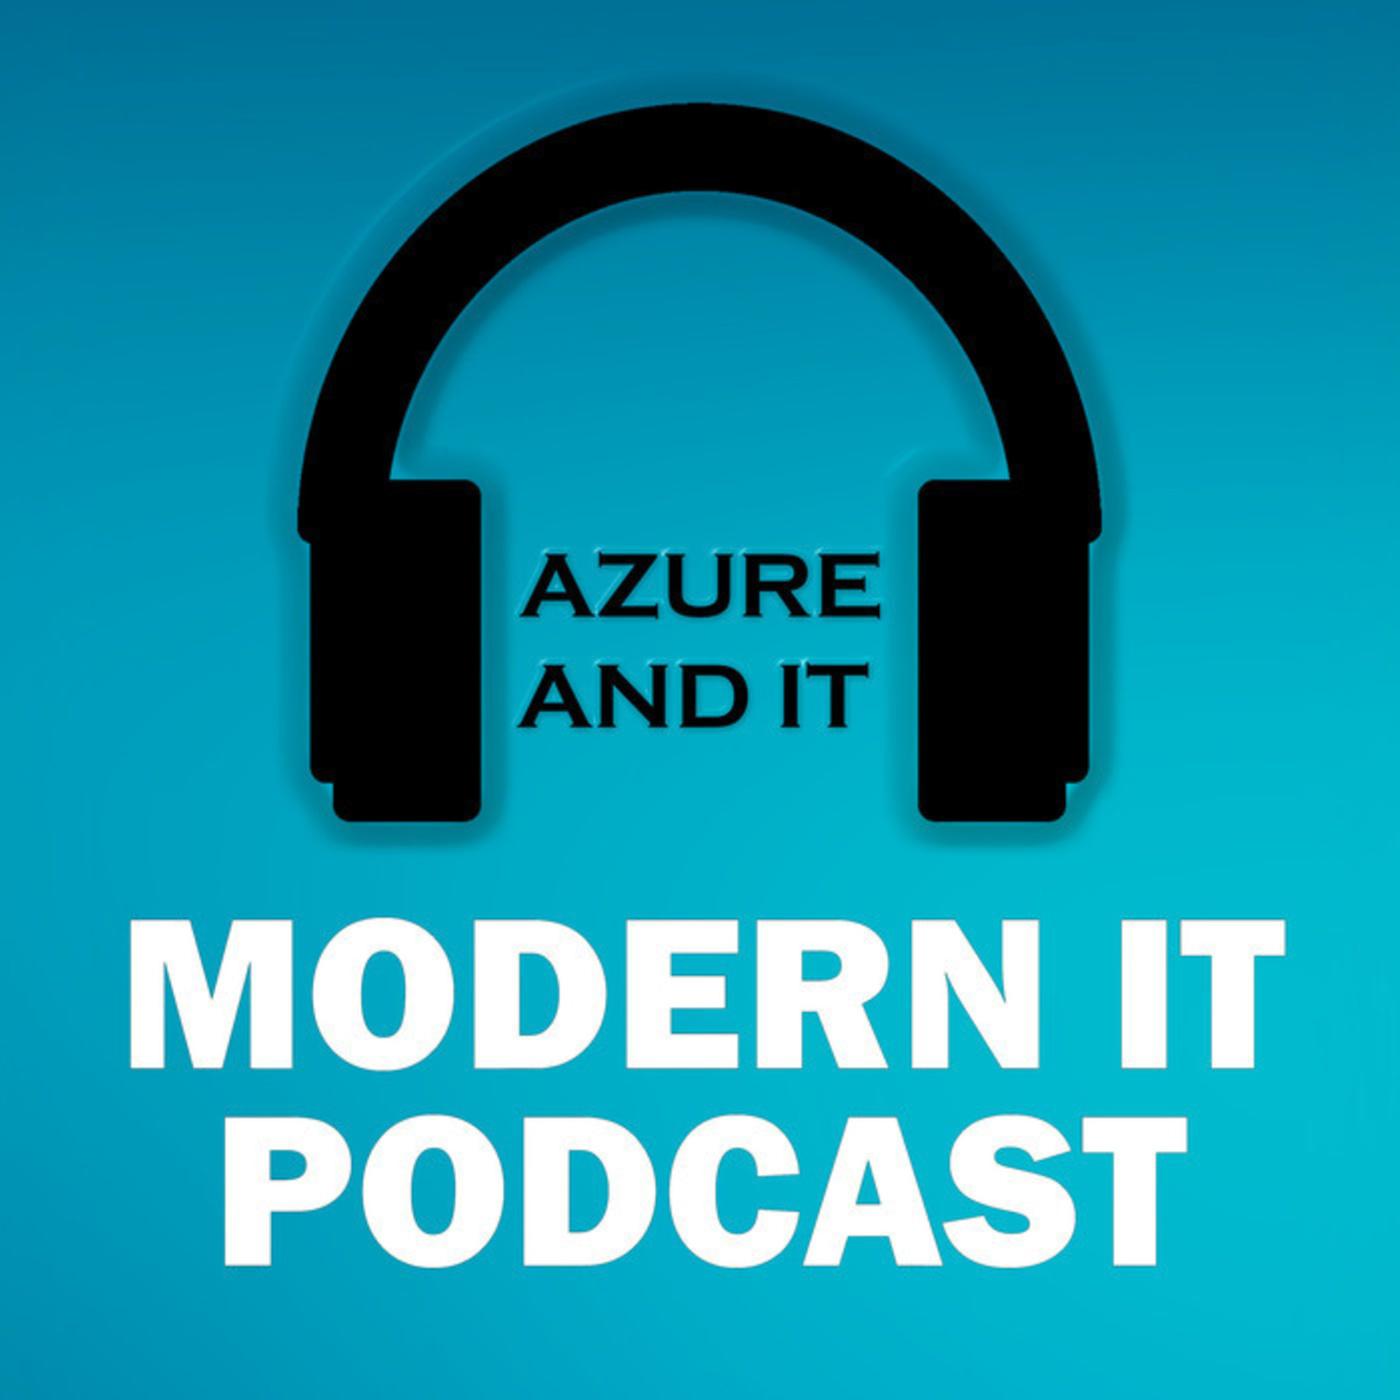 Modern IT Podcast   Listen Free on Castbox